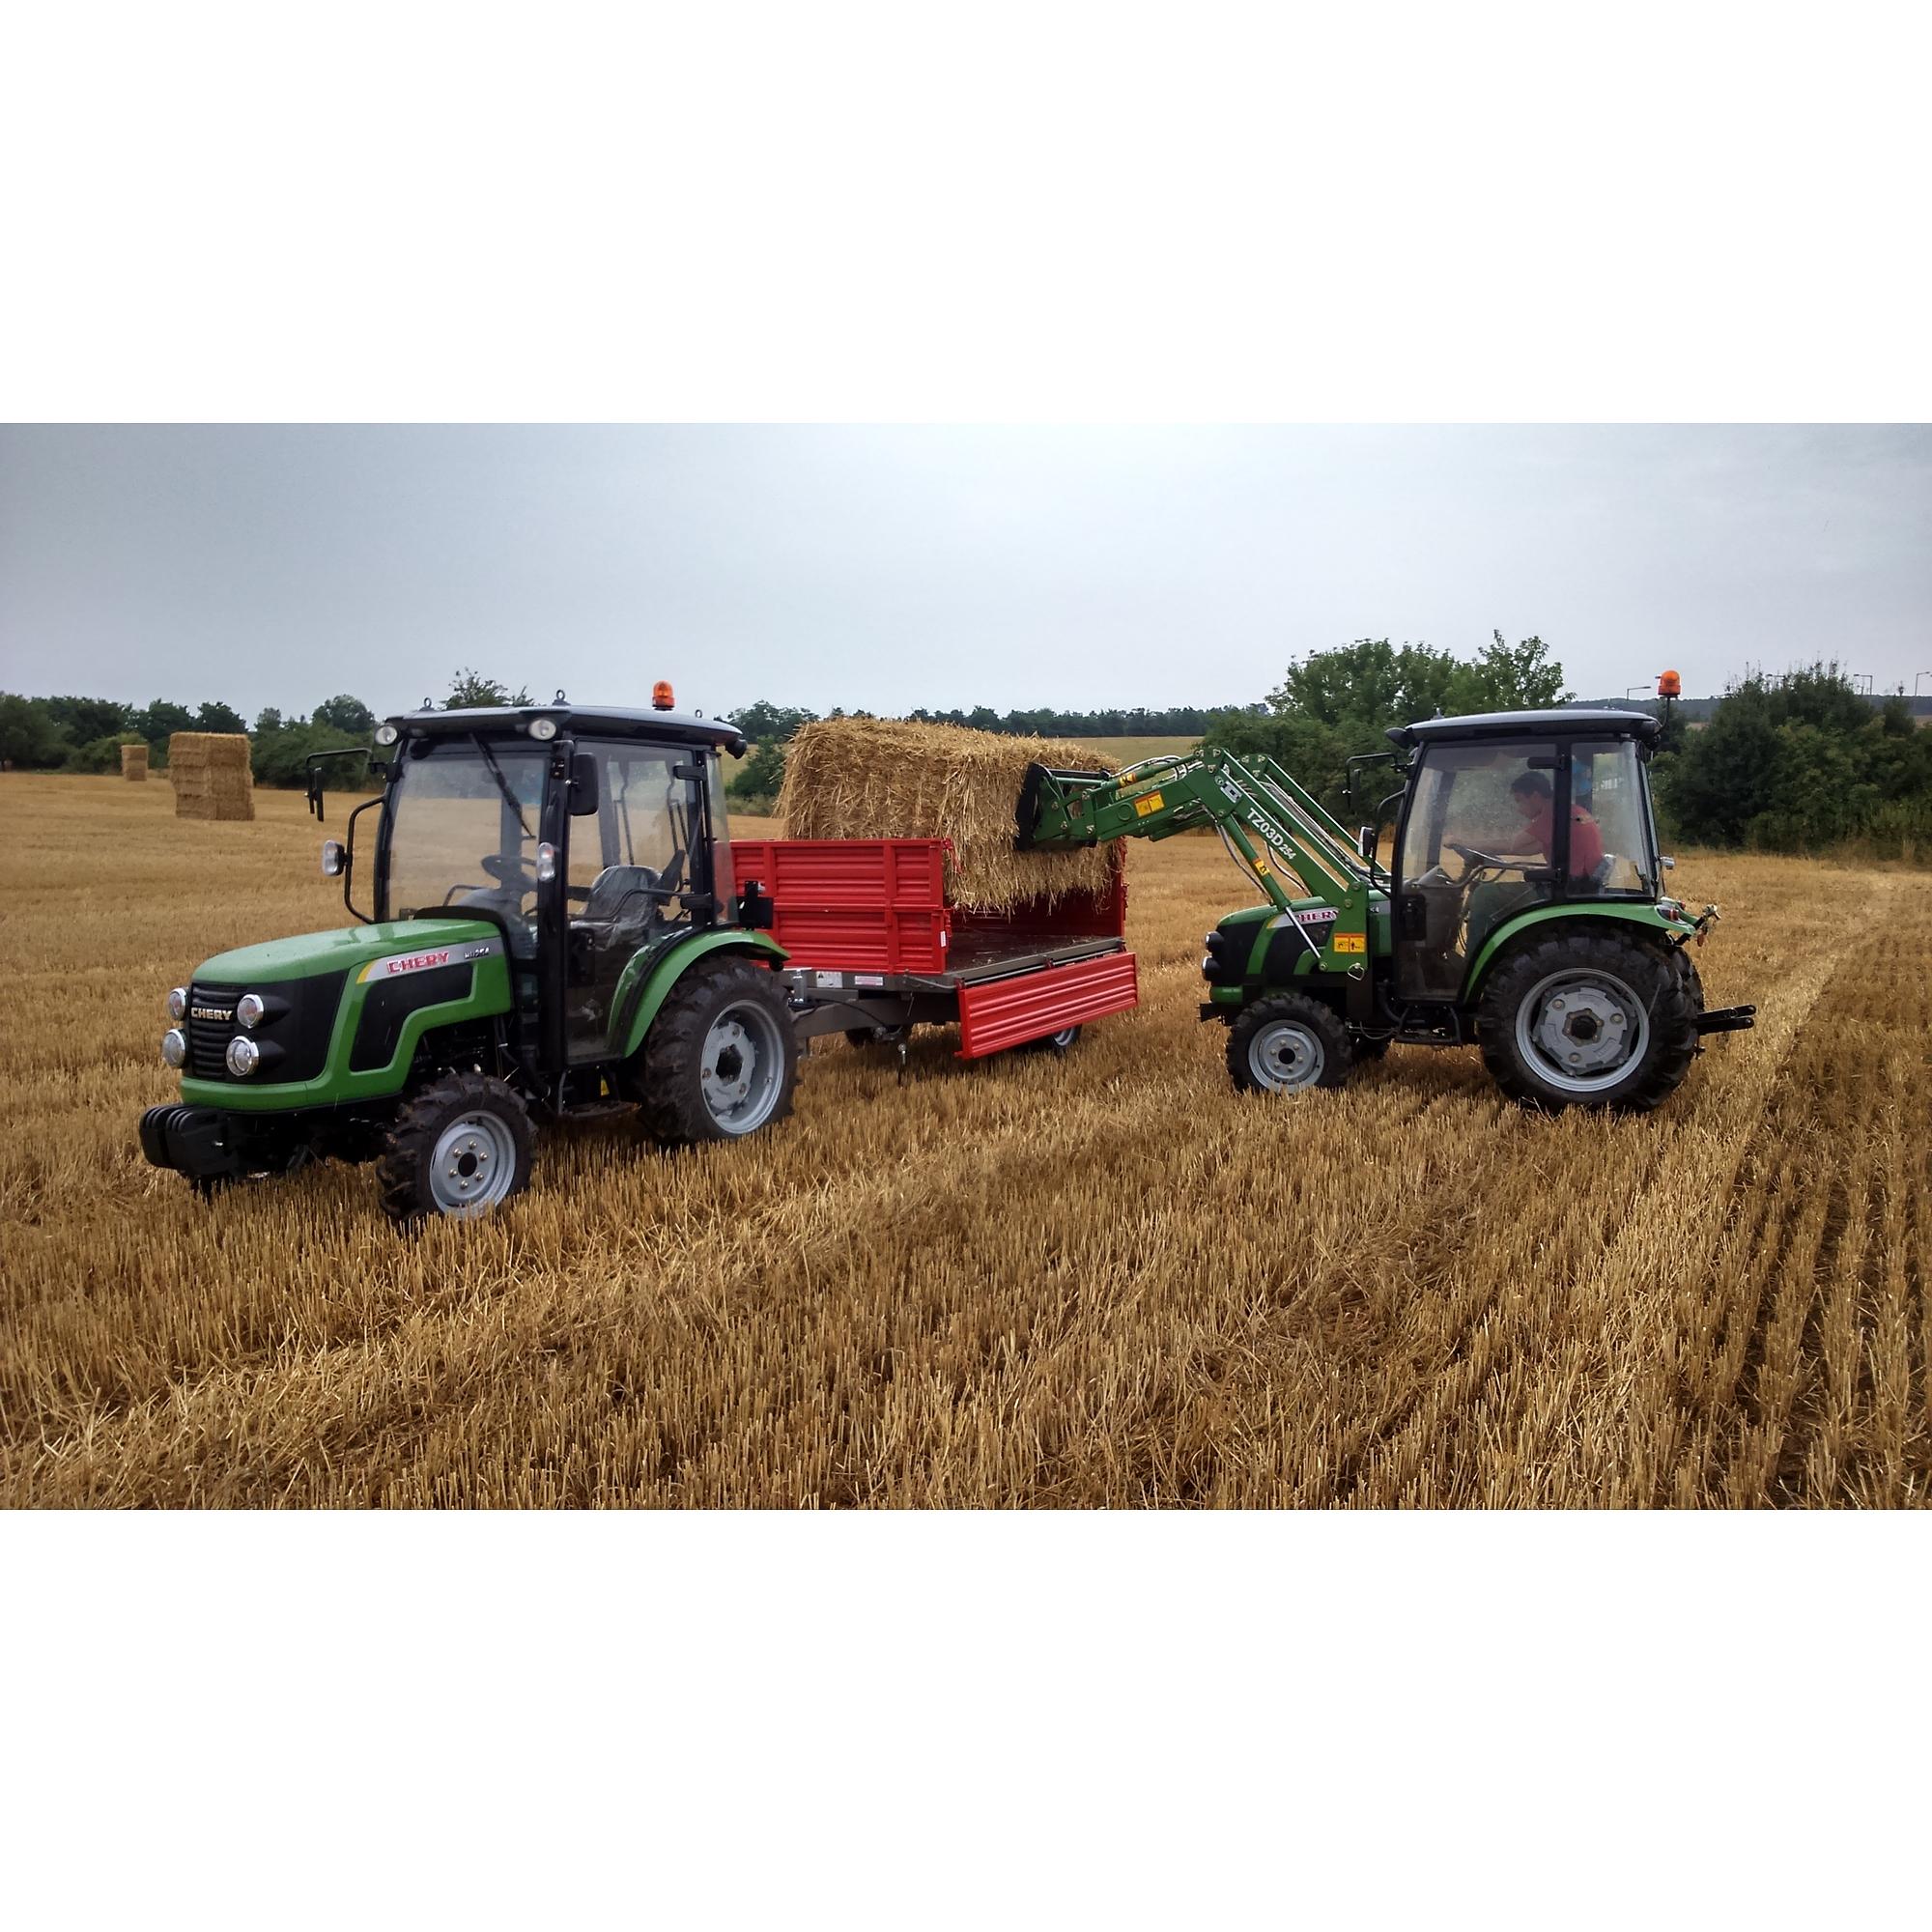 zoomlion-traktor-25-le-fulkes-rd254-15